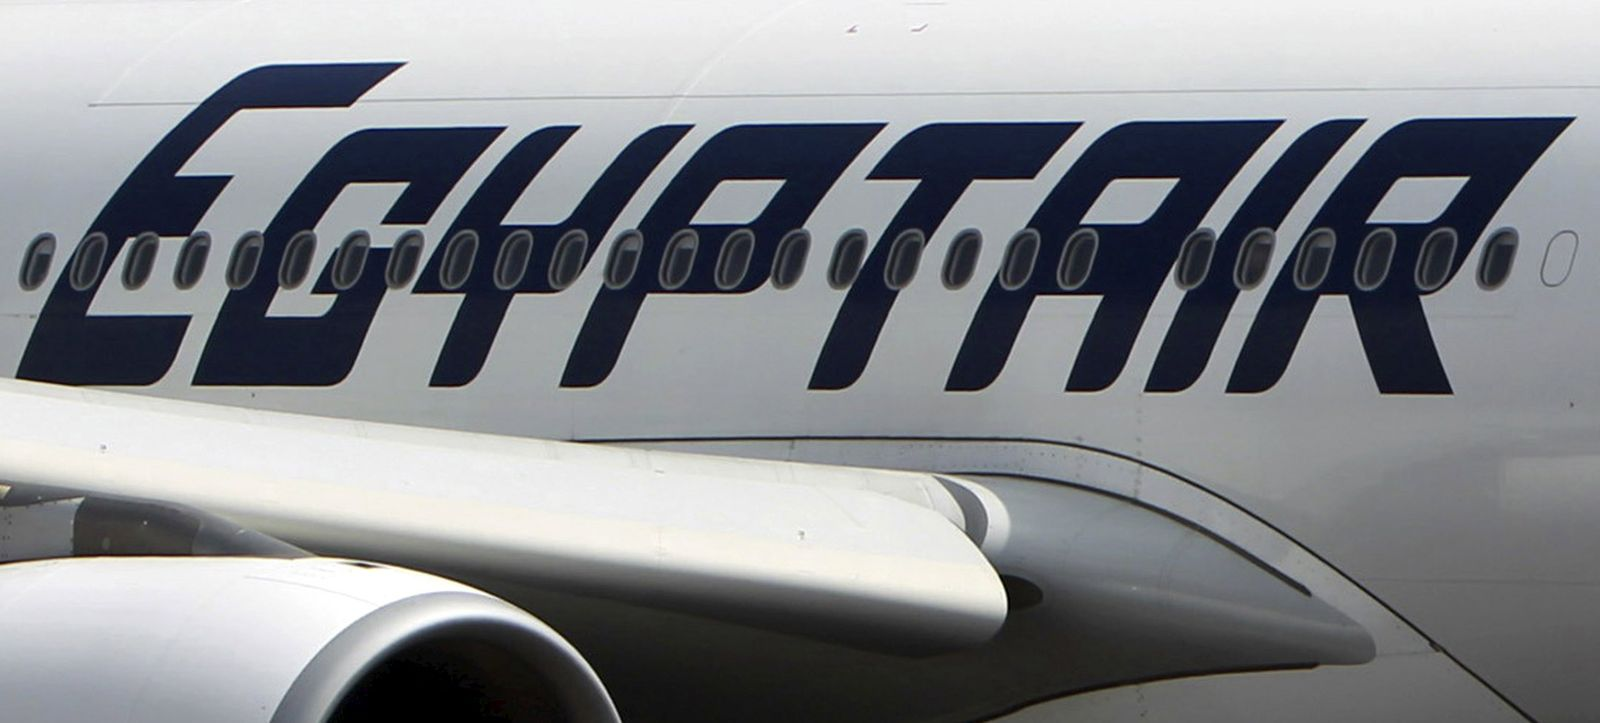 EGYPT AIRPLANE/HIJACKING